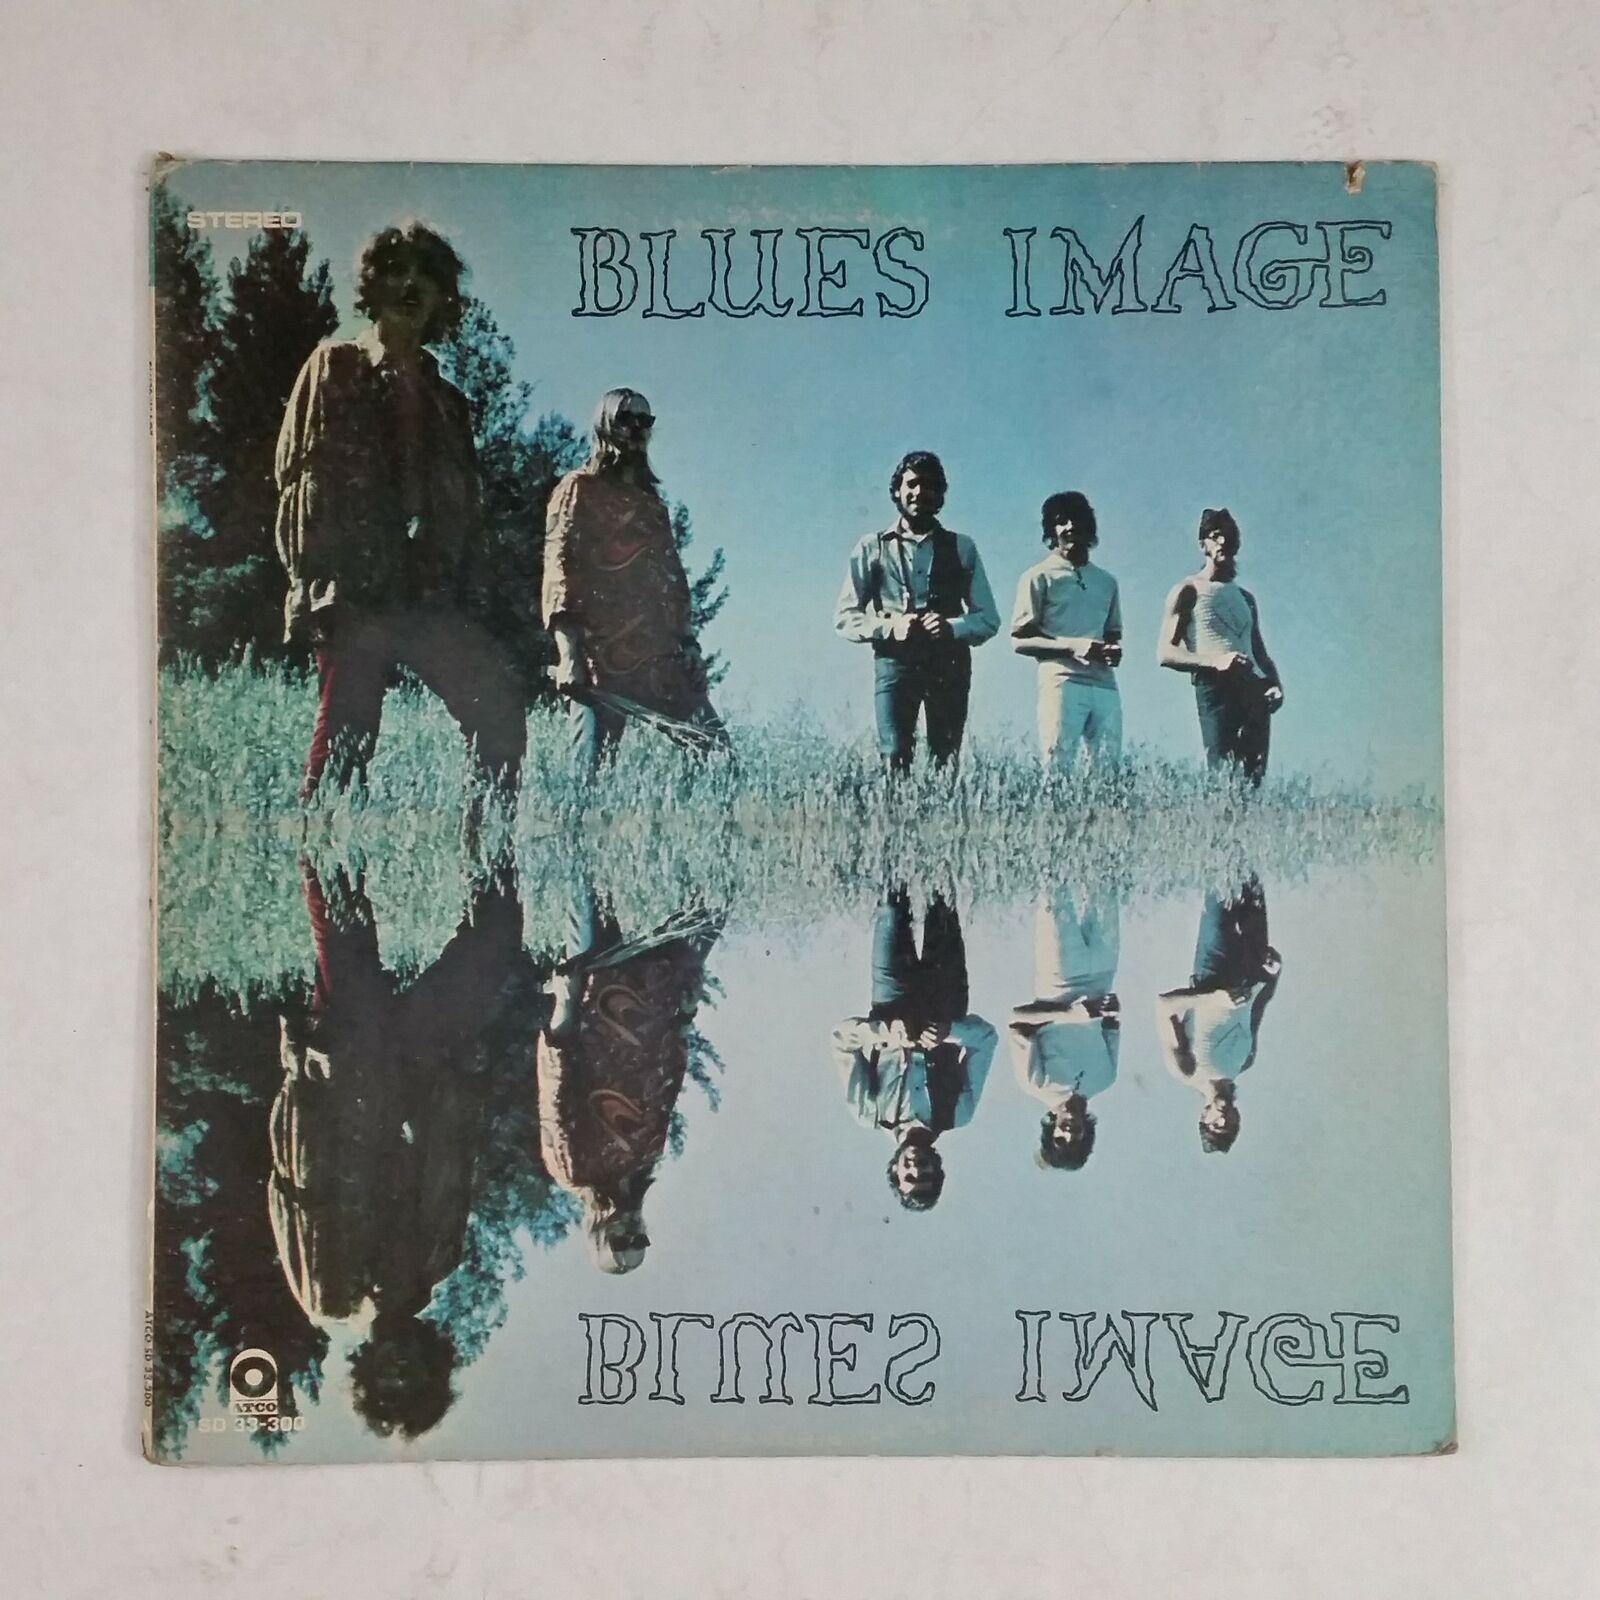 BLUES IMAGE s/t SD33300 LP Vinyl VG+ Cover VG near + Small Notch